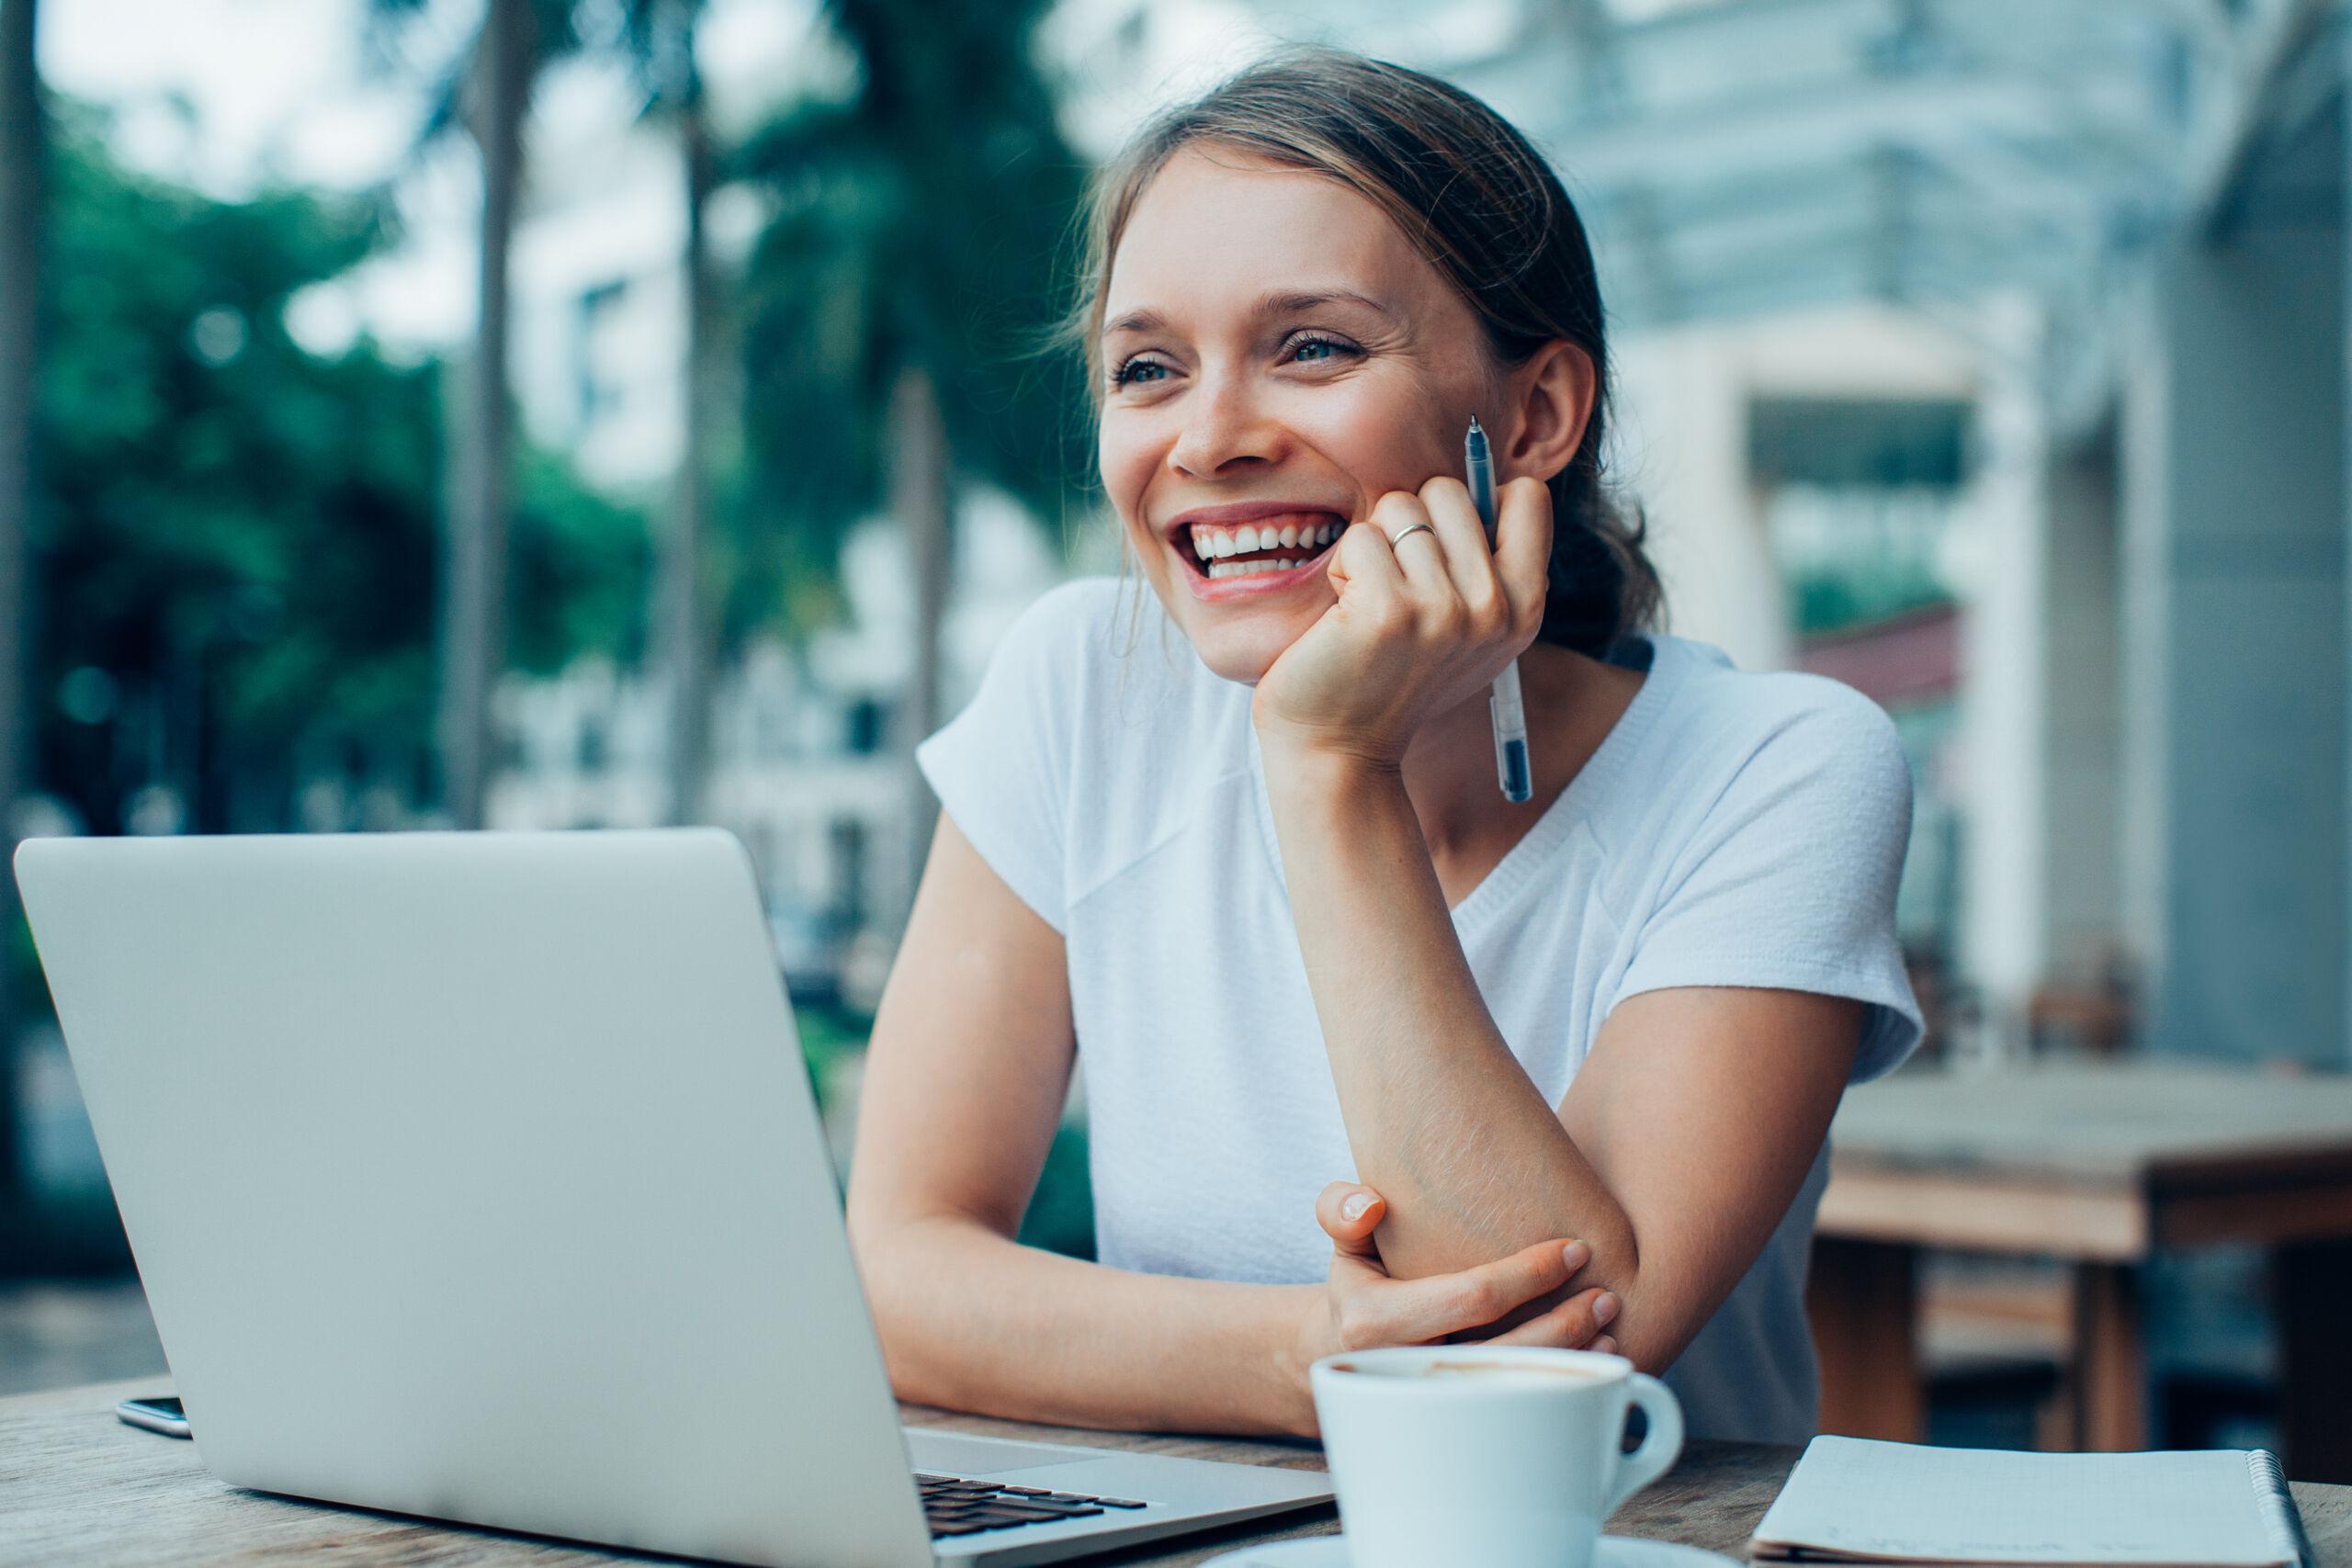 profiles that land freelance jobs online